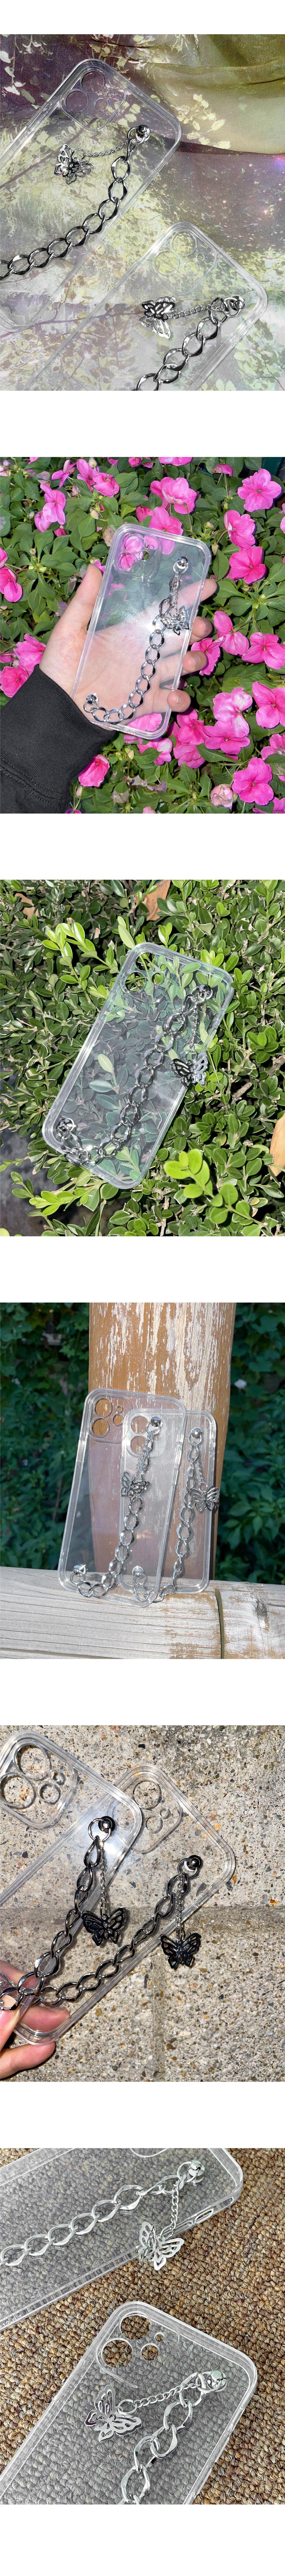 Bedy Butterfly Strap iPhone Case